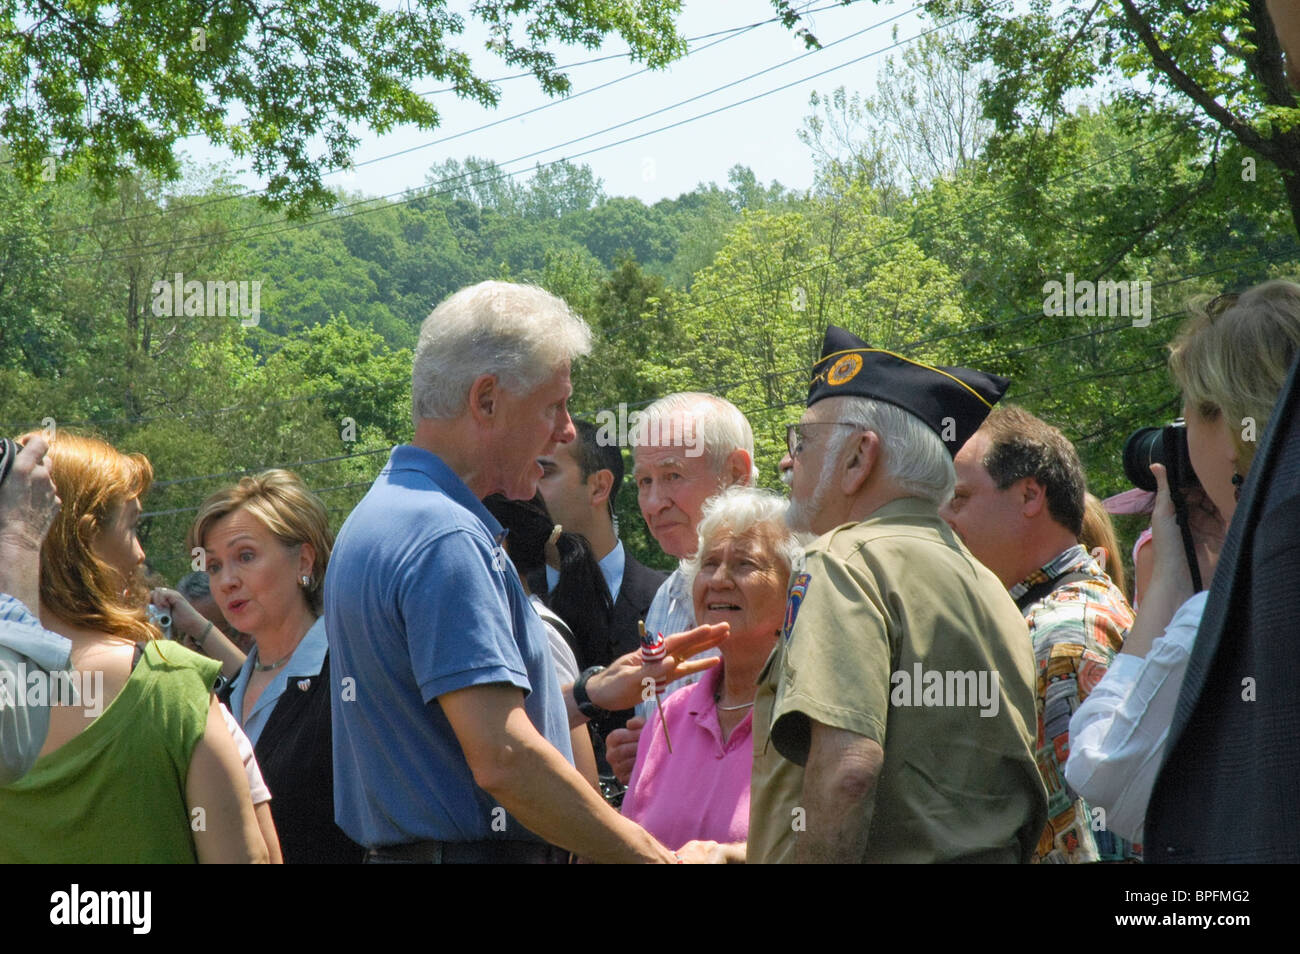 bill-clinton-and-hillary-clinton-shake-hands-with-world-war-ii-veteran-BPFMG2.jpg